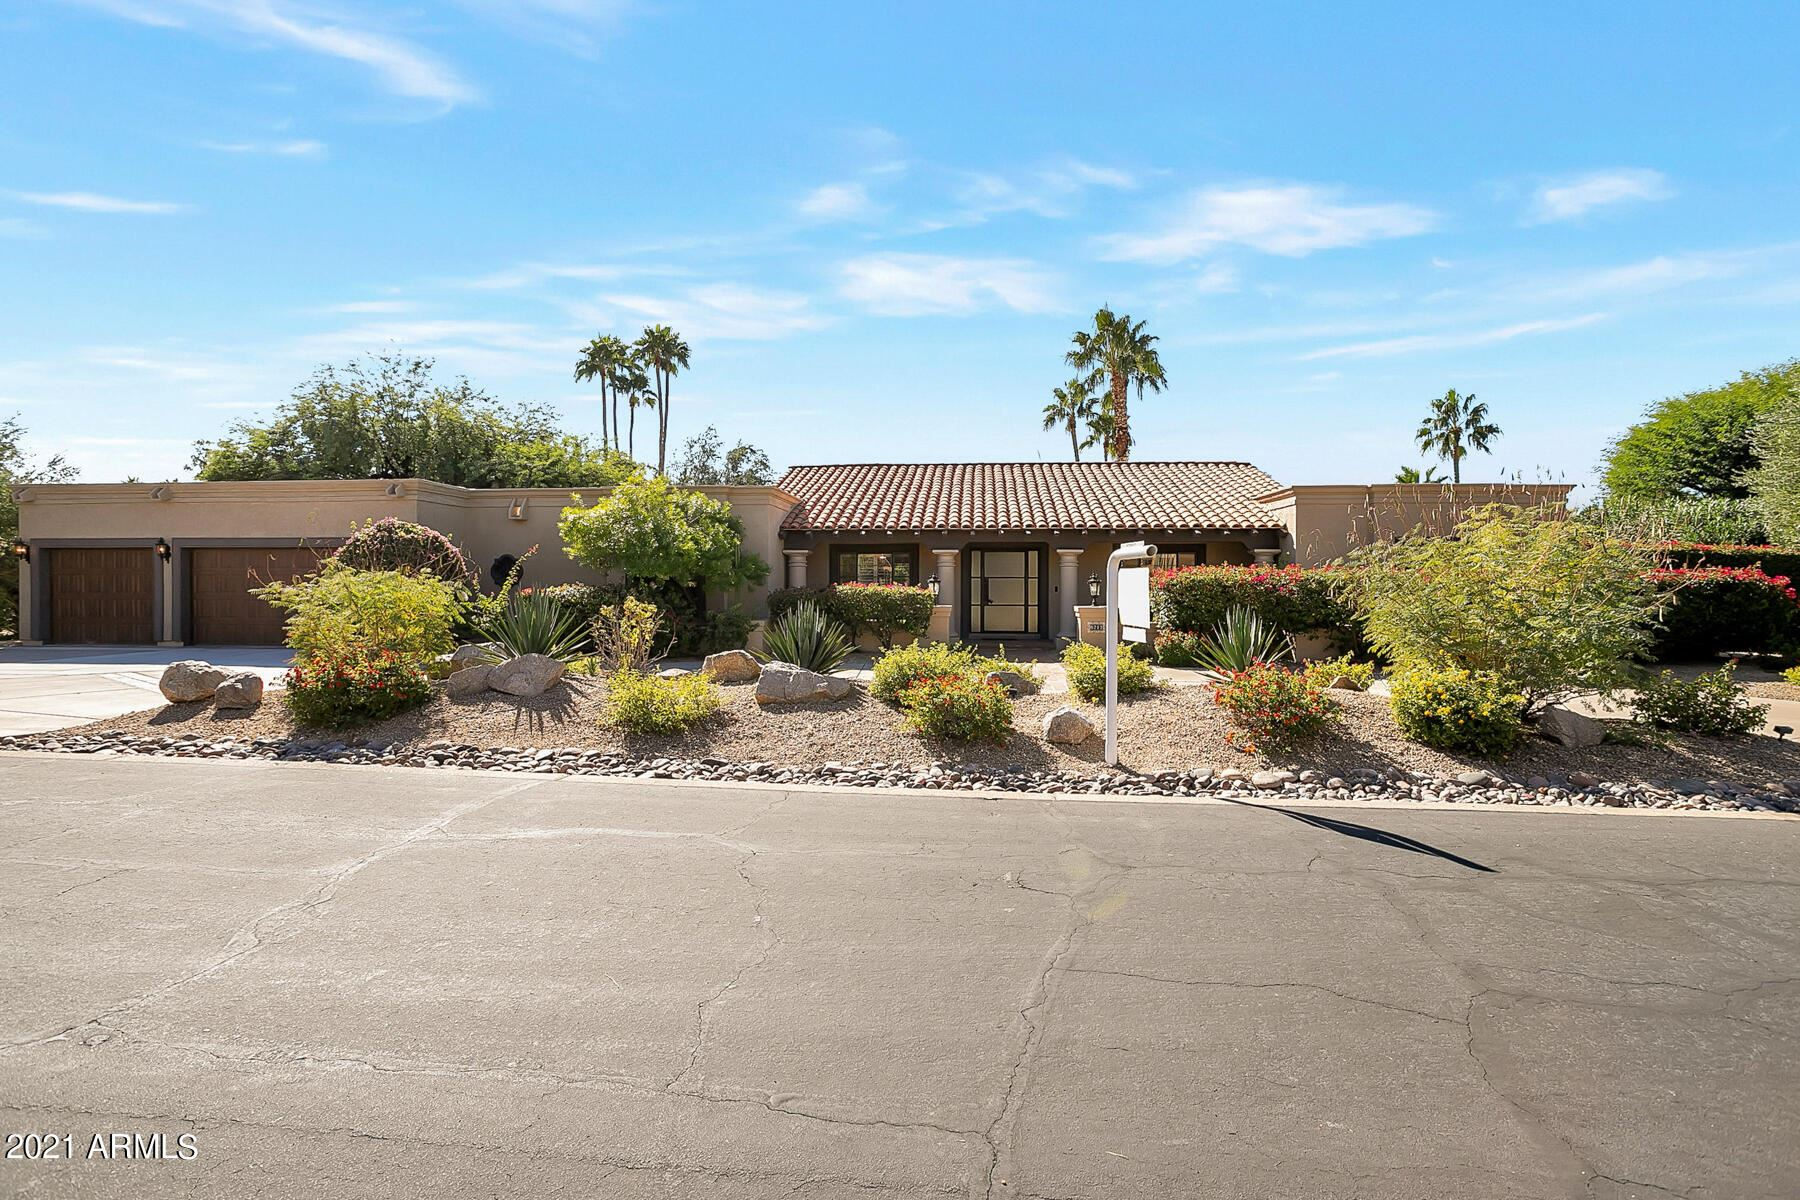 8217 E CANDELARIA Drive, Scottsdale, AZ 85255 - #: 6285740